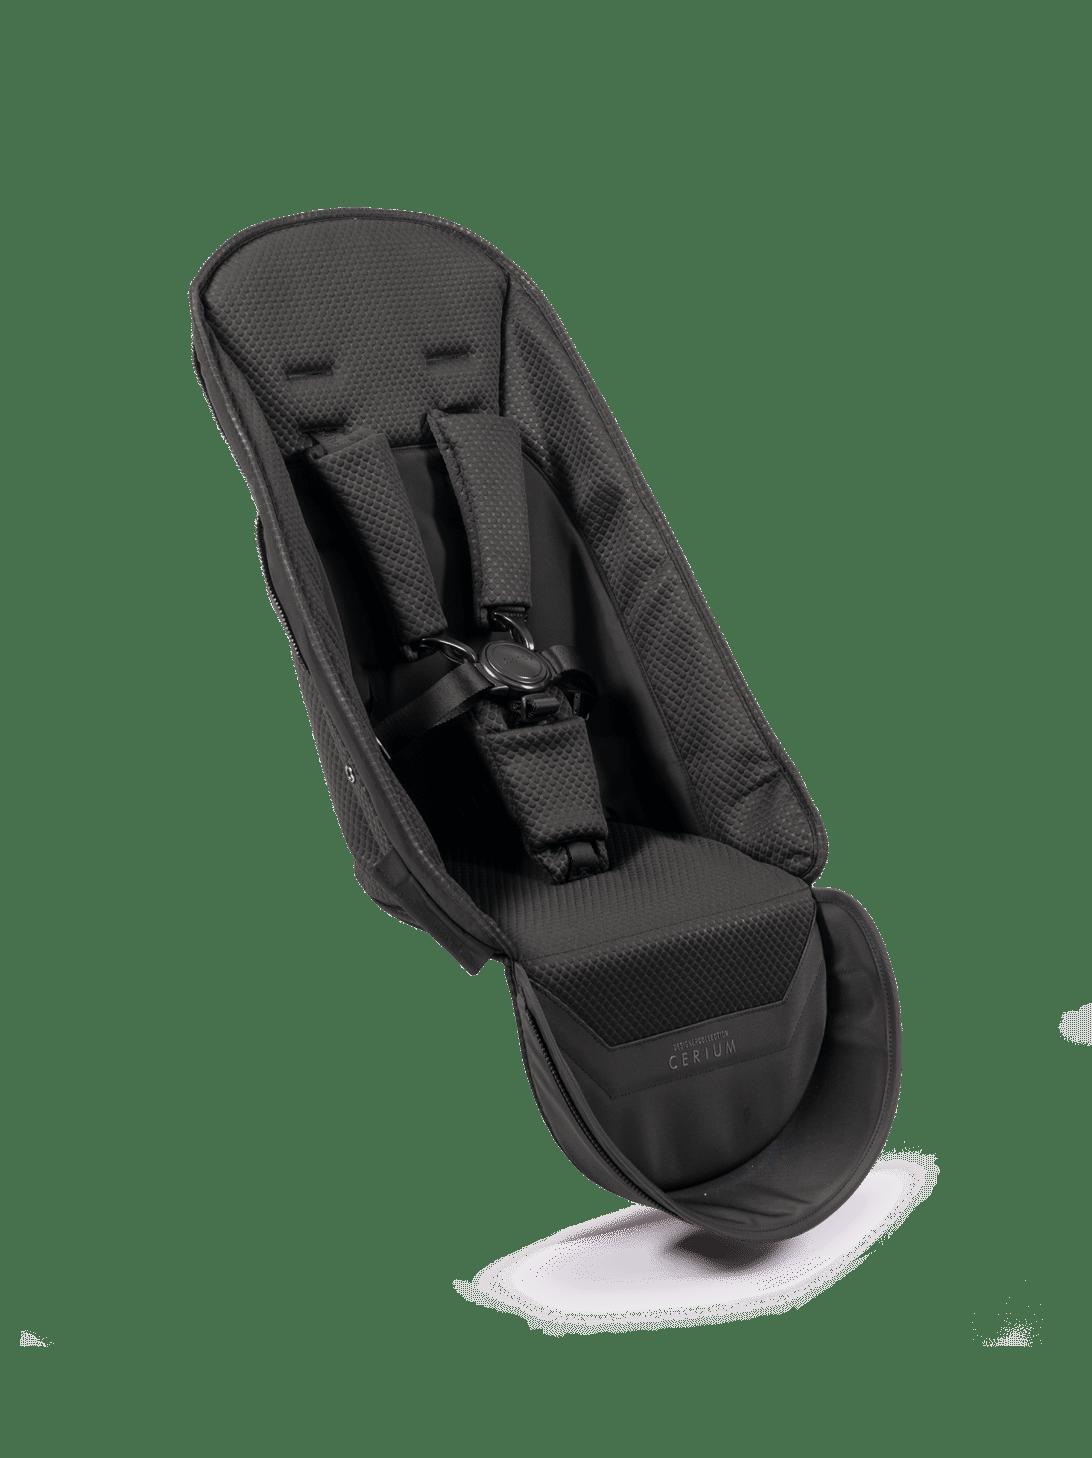 Peach 2nd Seat Fabric - Cerium